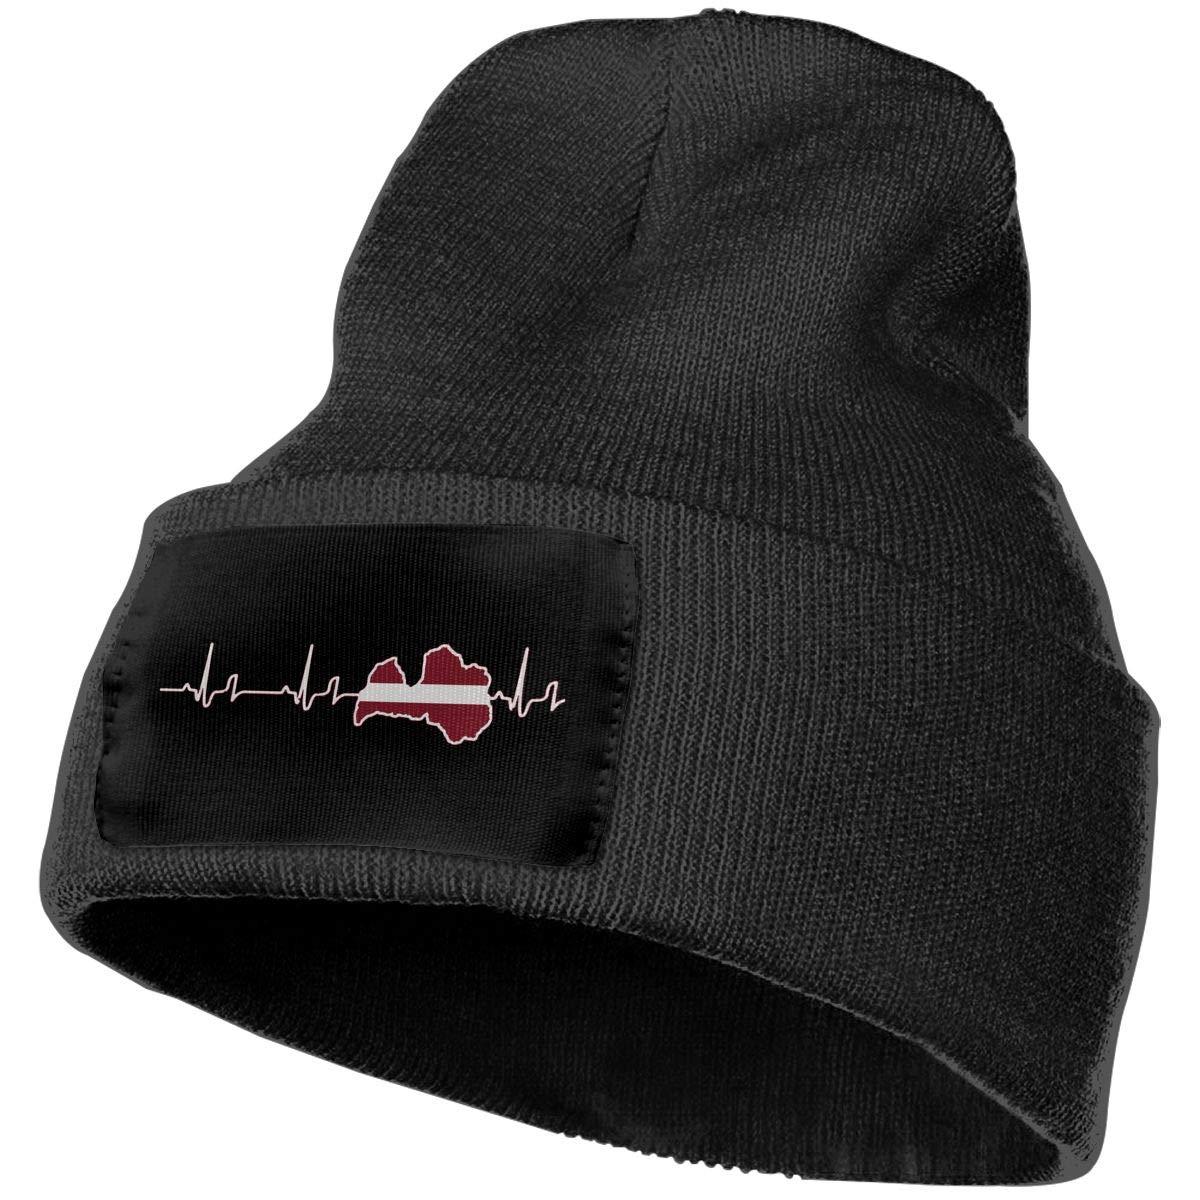 Latvia Outdoor Warm Knit Beanies Hat Soft Winter Knit Caps Men//Women Heartbeat